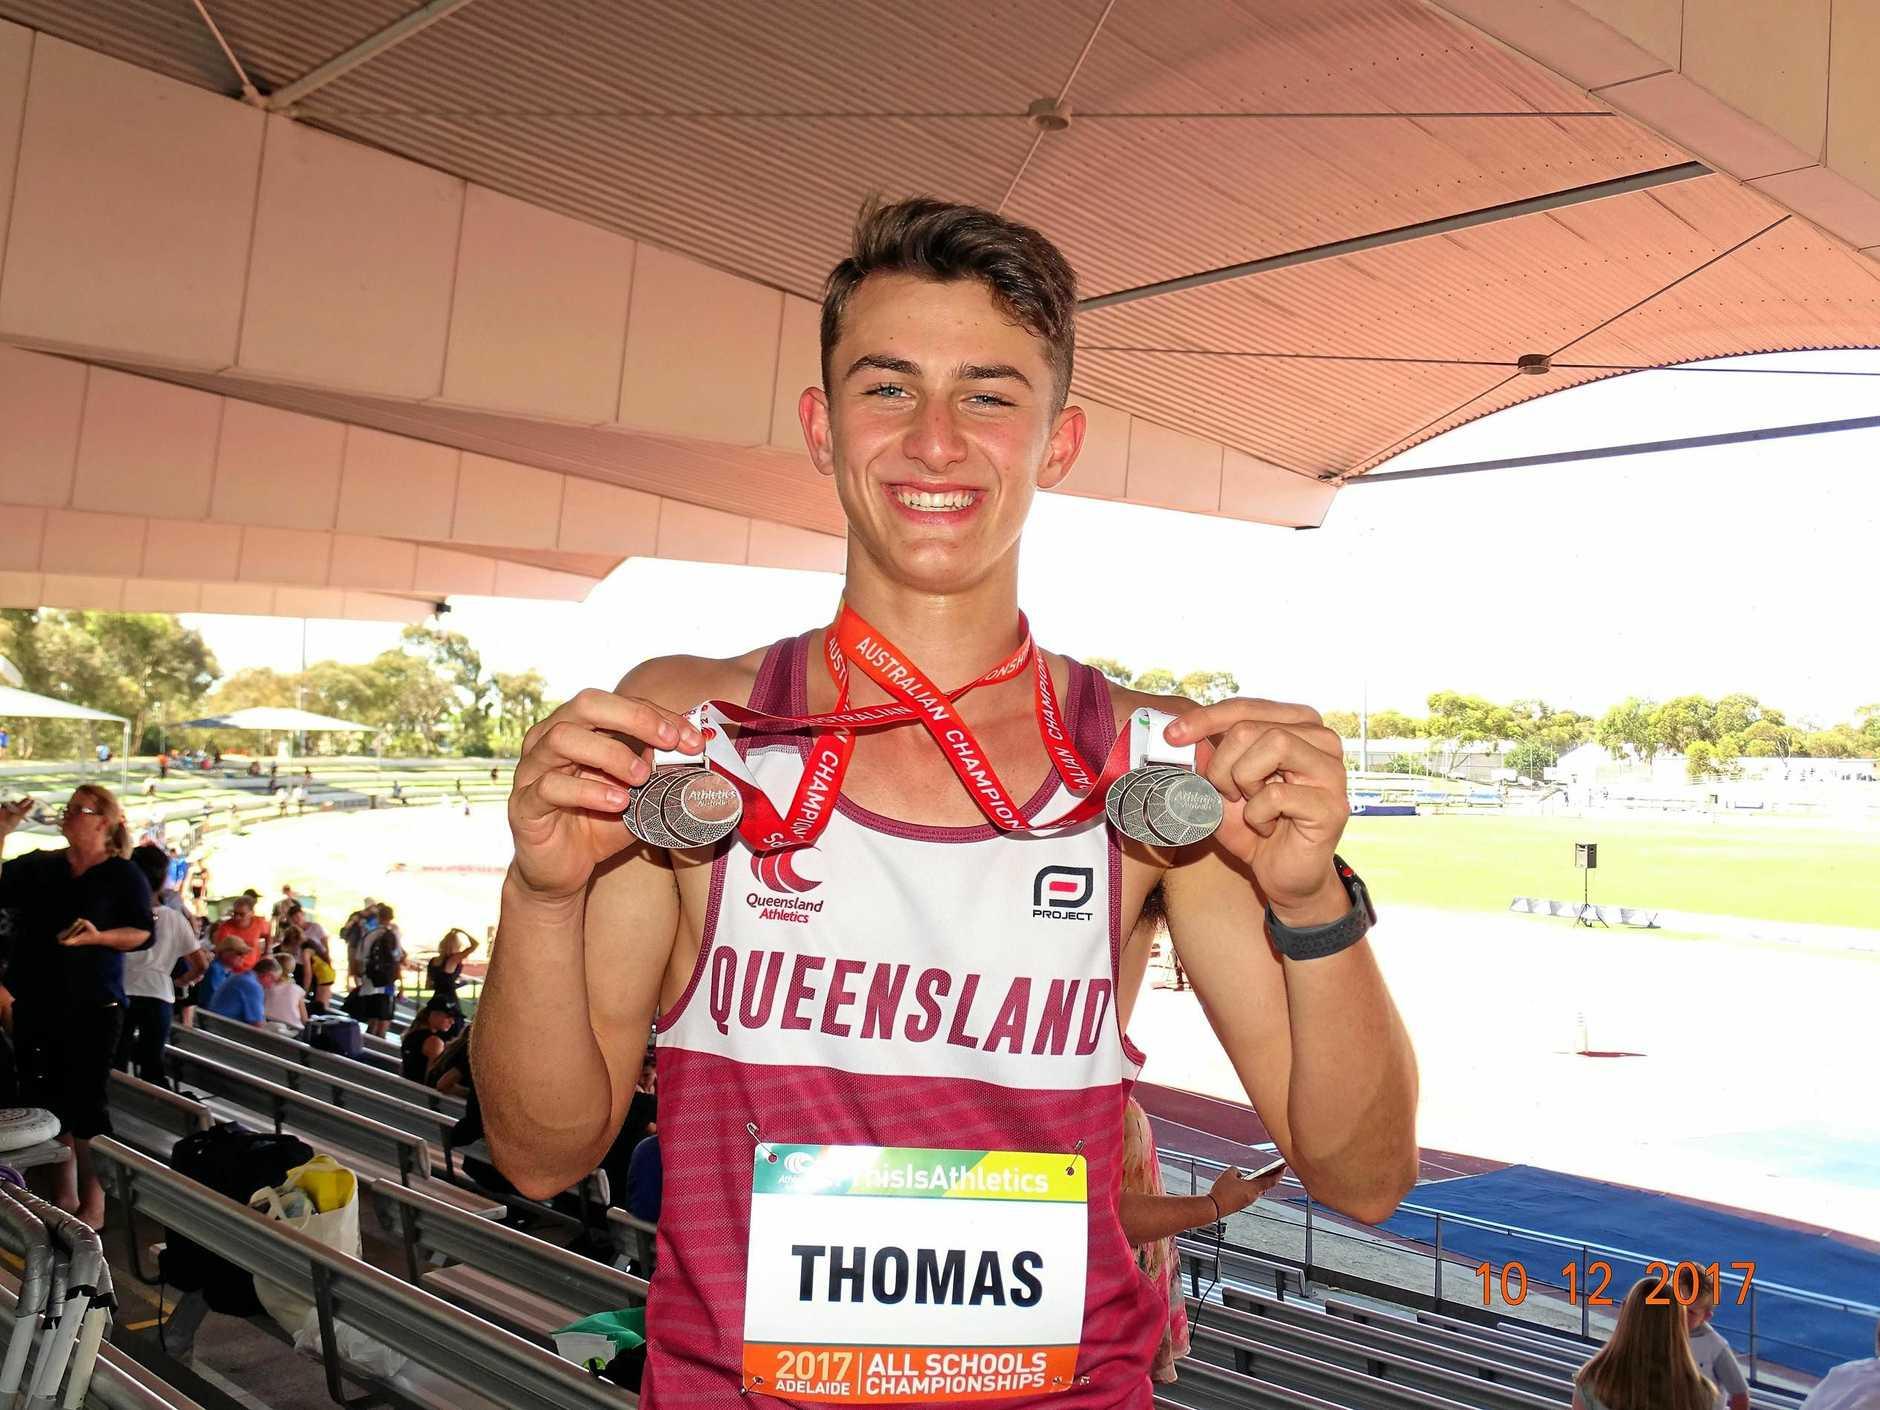 Ipswich athlete Benjamin Thomas